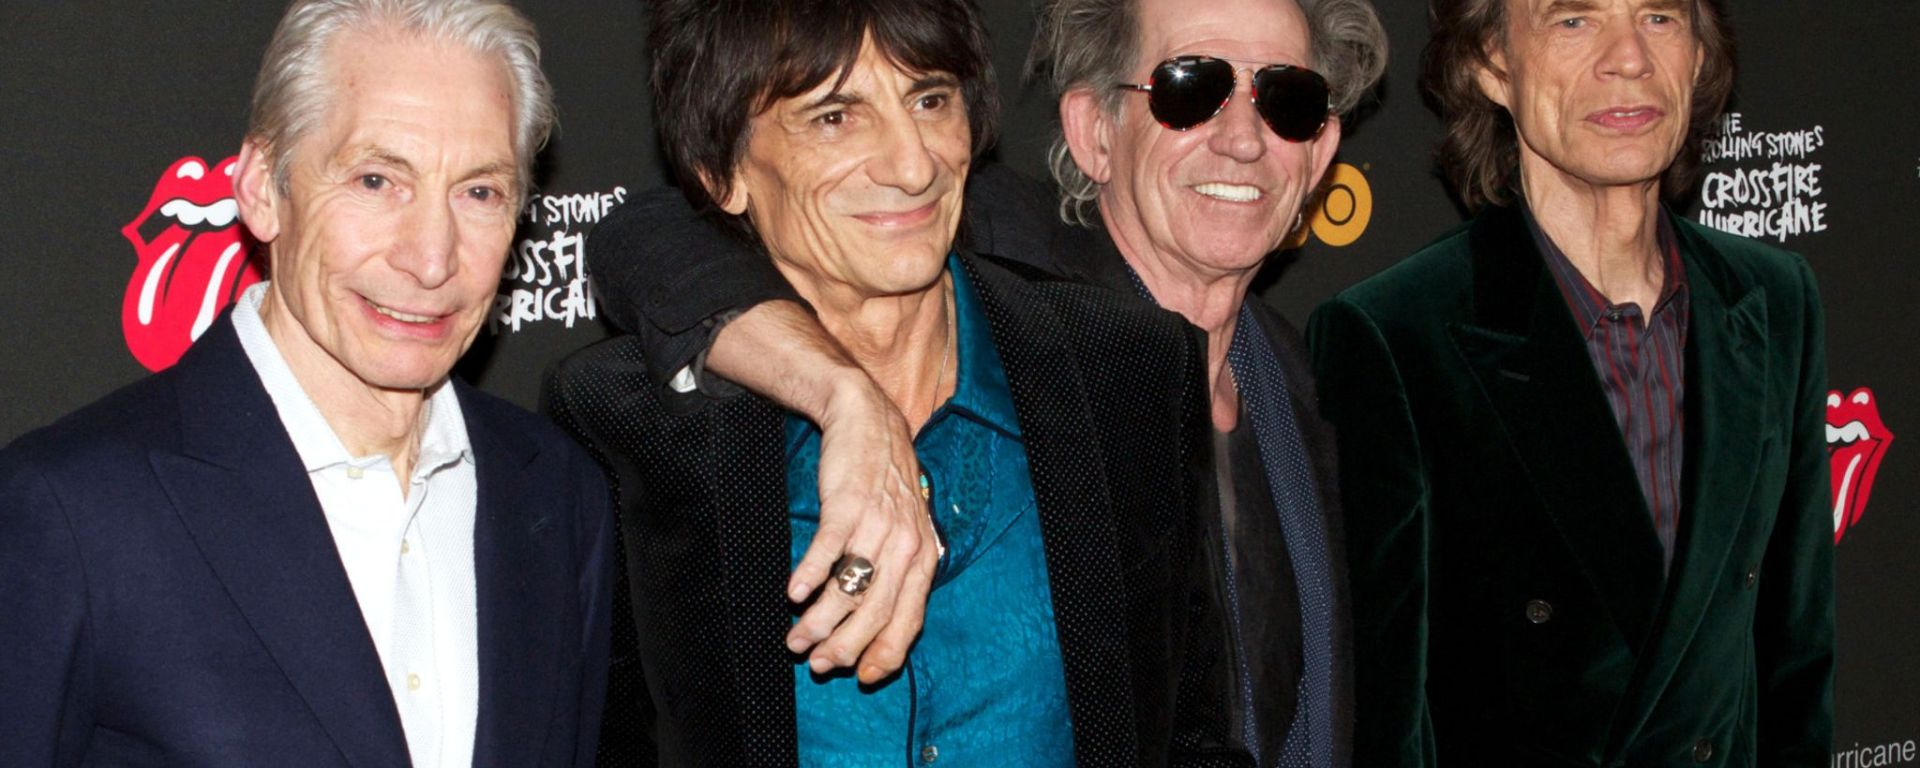 The Rolling Stones a distribuit un videoclip tribut bateristului Charlie Watts